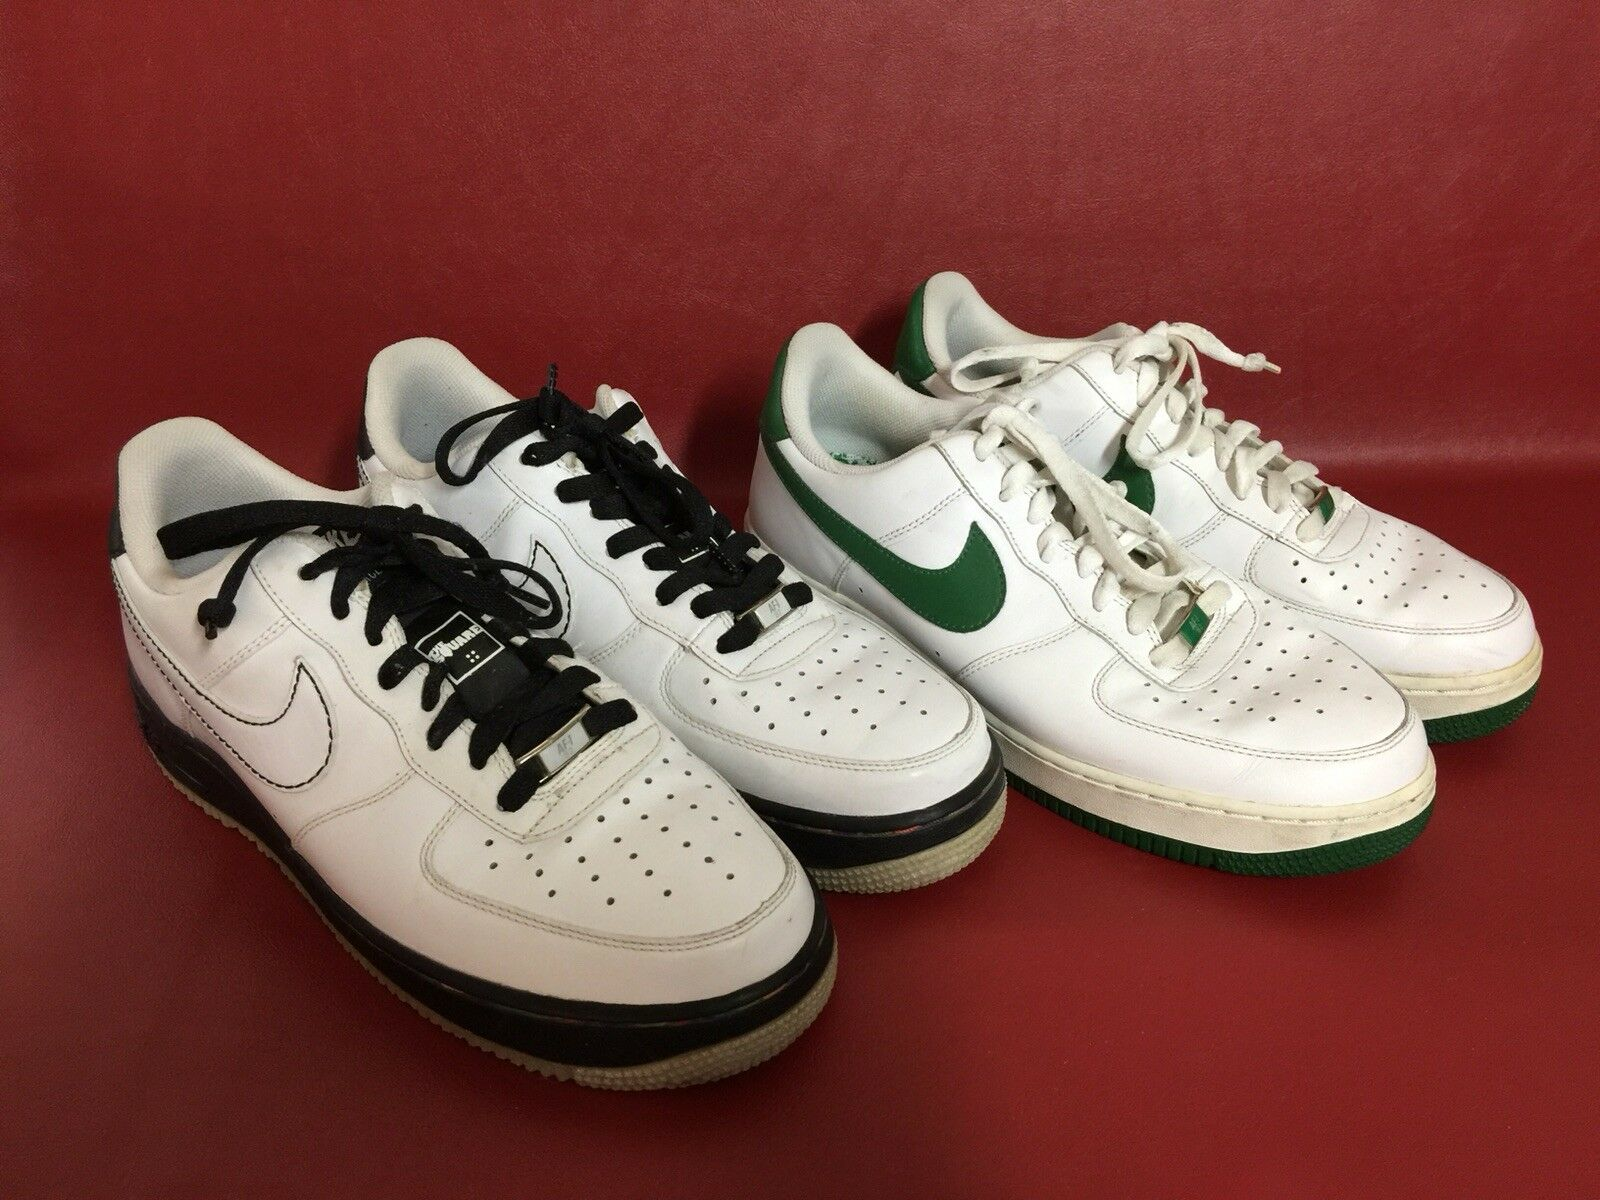 2 Pair Nike Air Force '06 XXV AF1-'82 Mens Mens Mens 9.5 Sneakers 315092-131 & 315122-112 b85d01